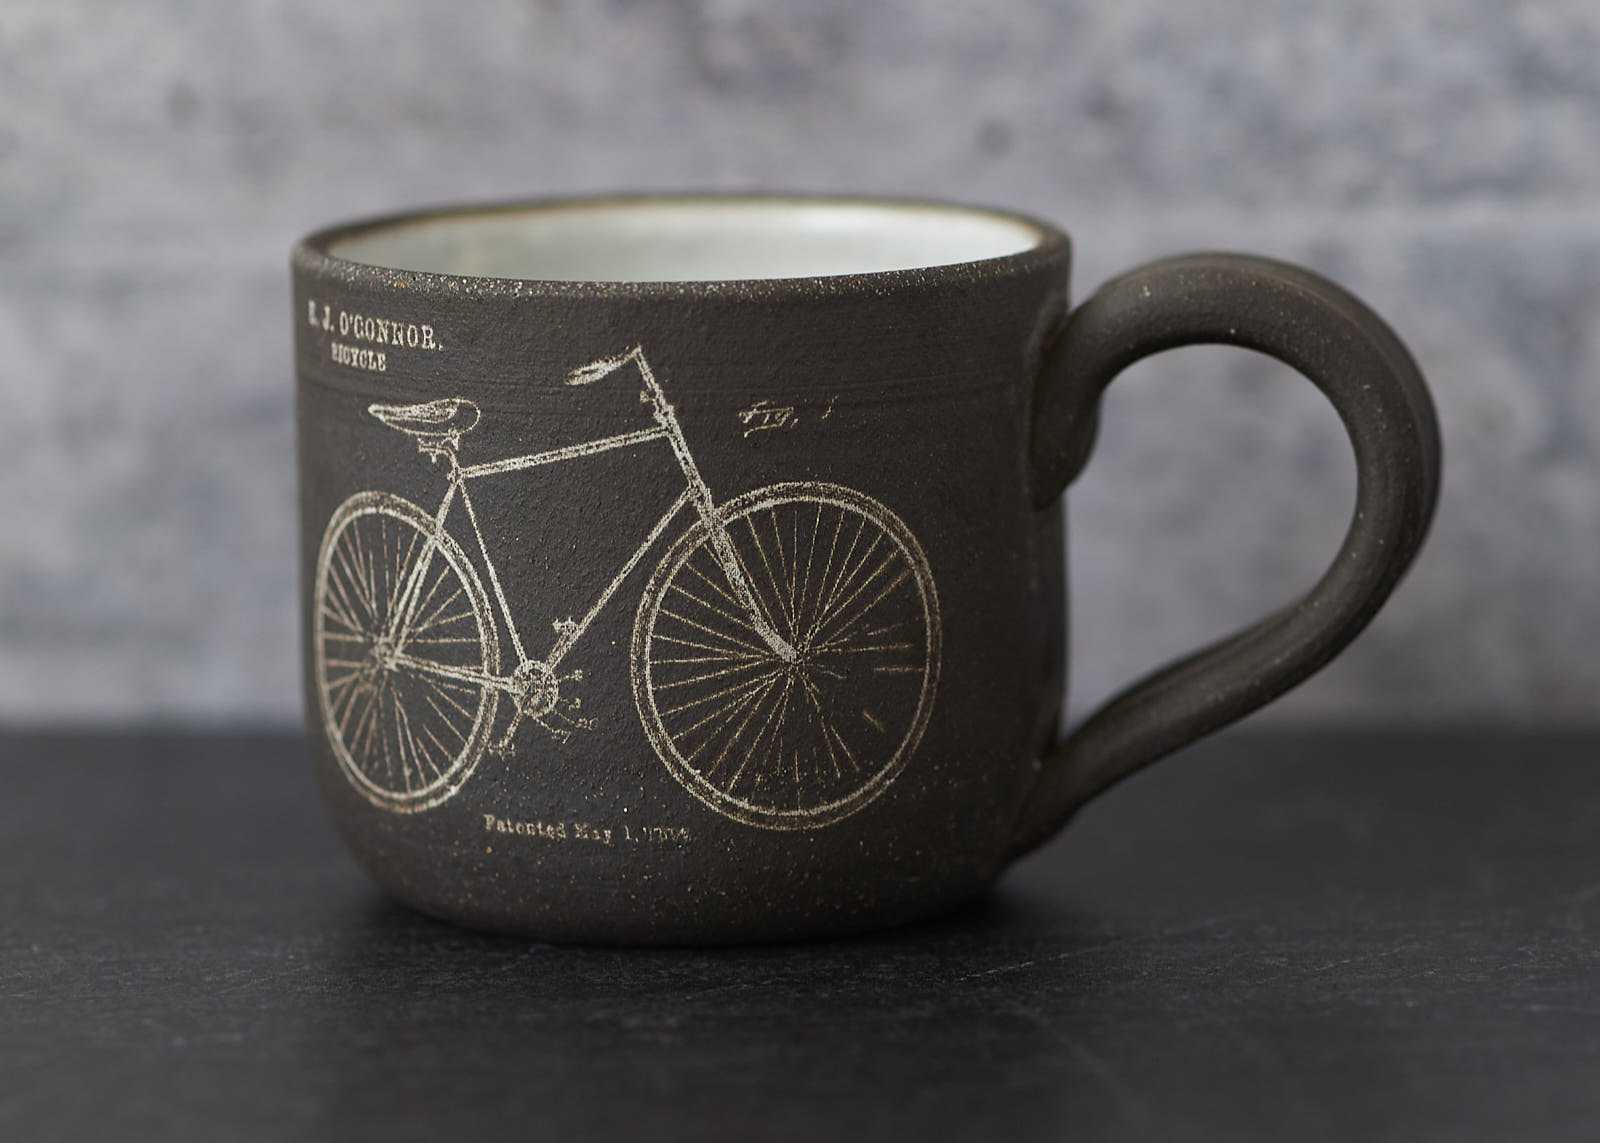 Bare Stone Pottery - Get a new mug